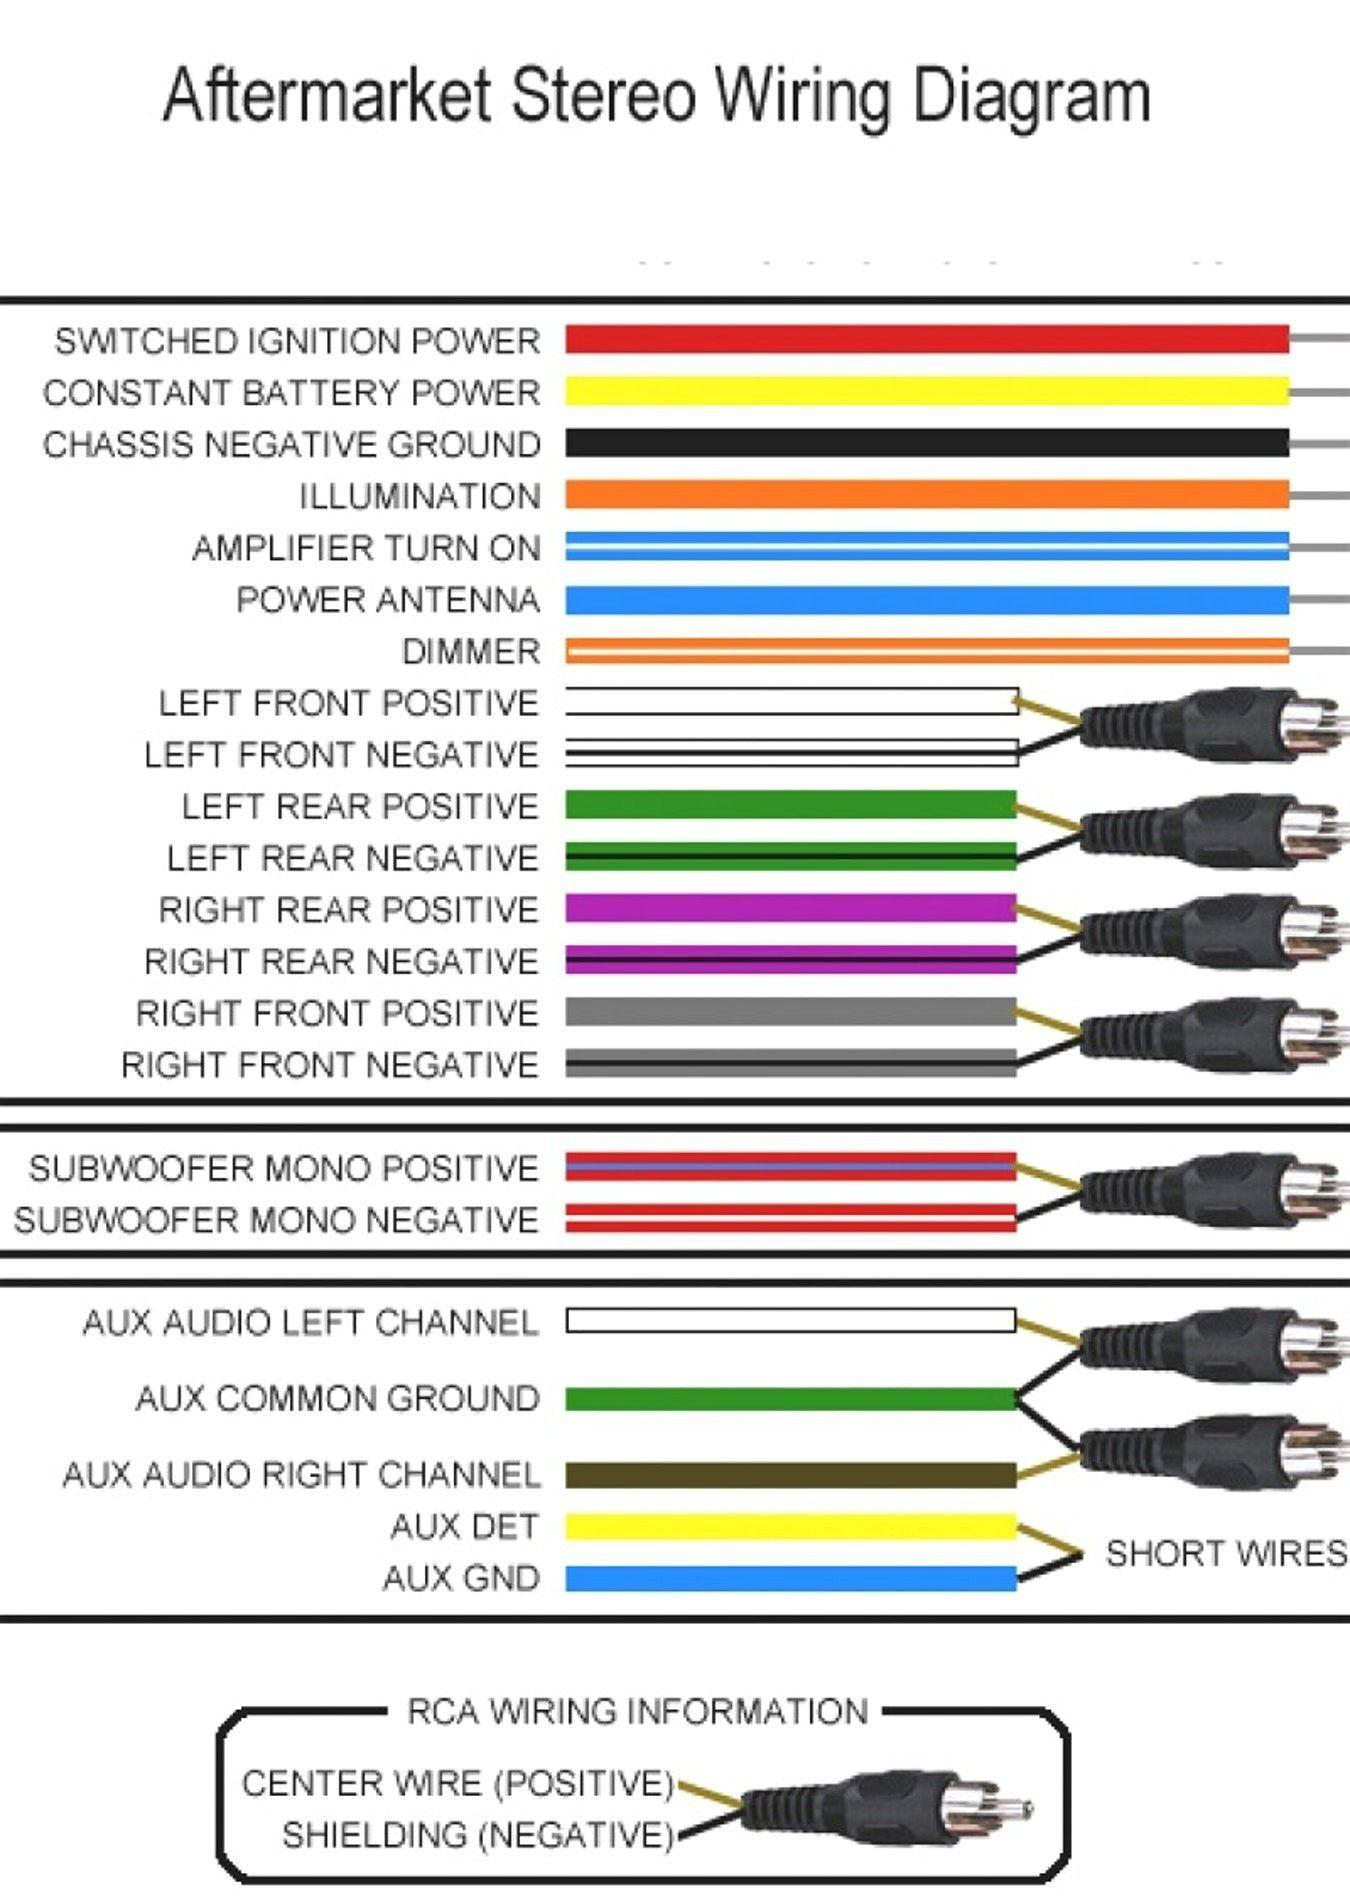 New Wiring Diagram For Bt Master Socket Diagrams Digramssample Diagramimages Wiringdiagramsample Wiringdiagra Sony Car Stereo Kenwood Car Subwoofer Wiring